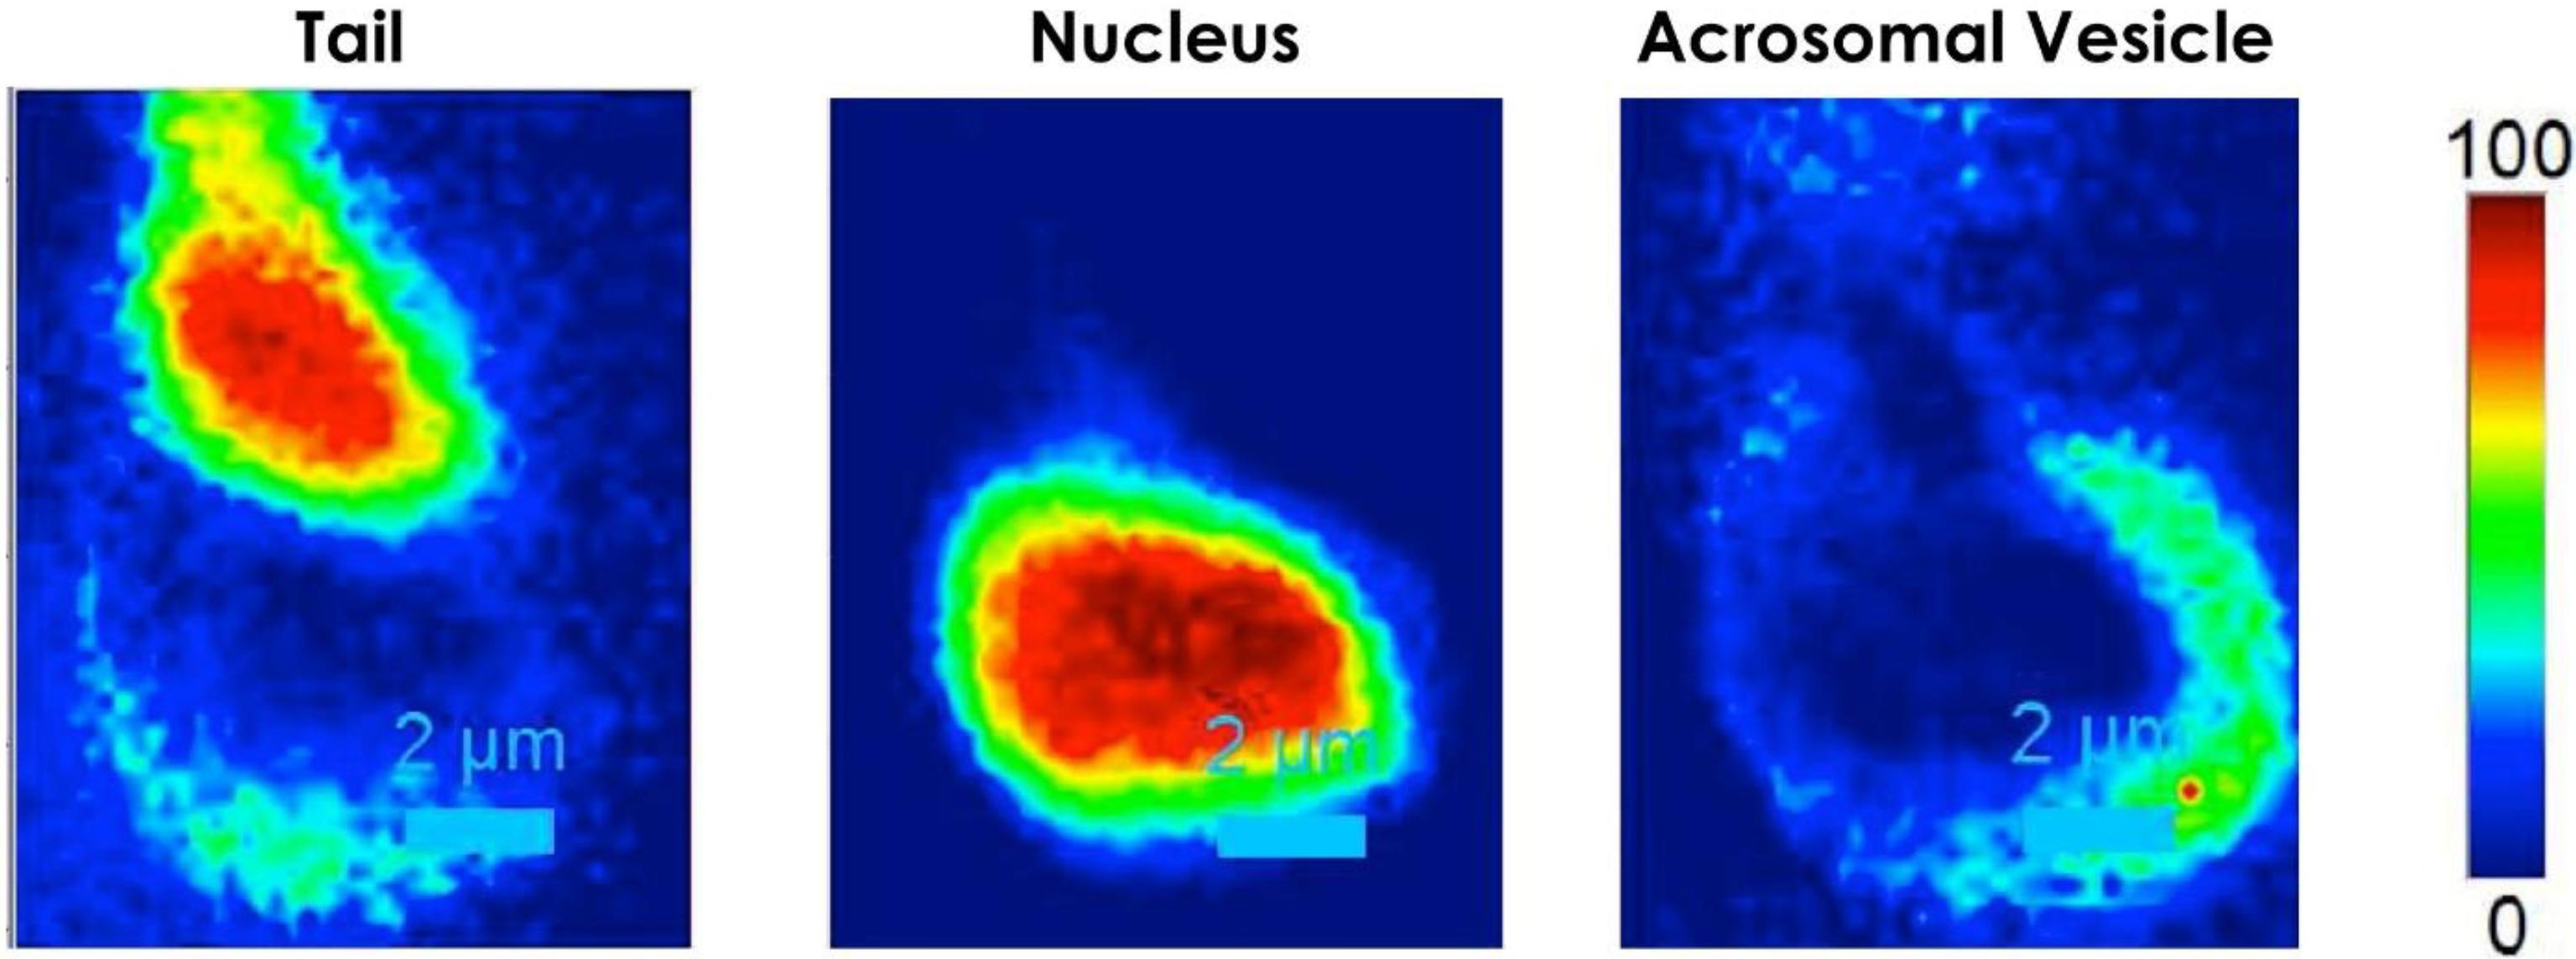 biochemical parameters of sperm flagellar motility Motility testing biochemical parameters of sperm flagellar motility initiation and regulationbiochemical parameters of sperm flagellar motility initiation and.